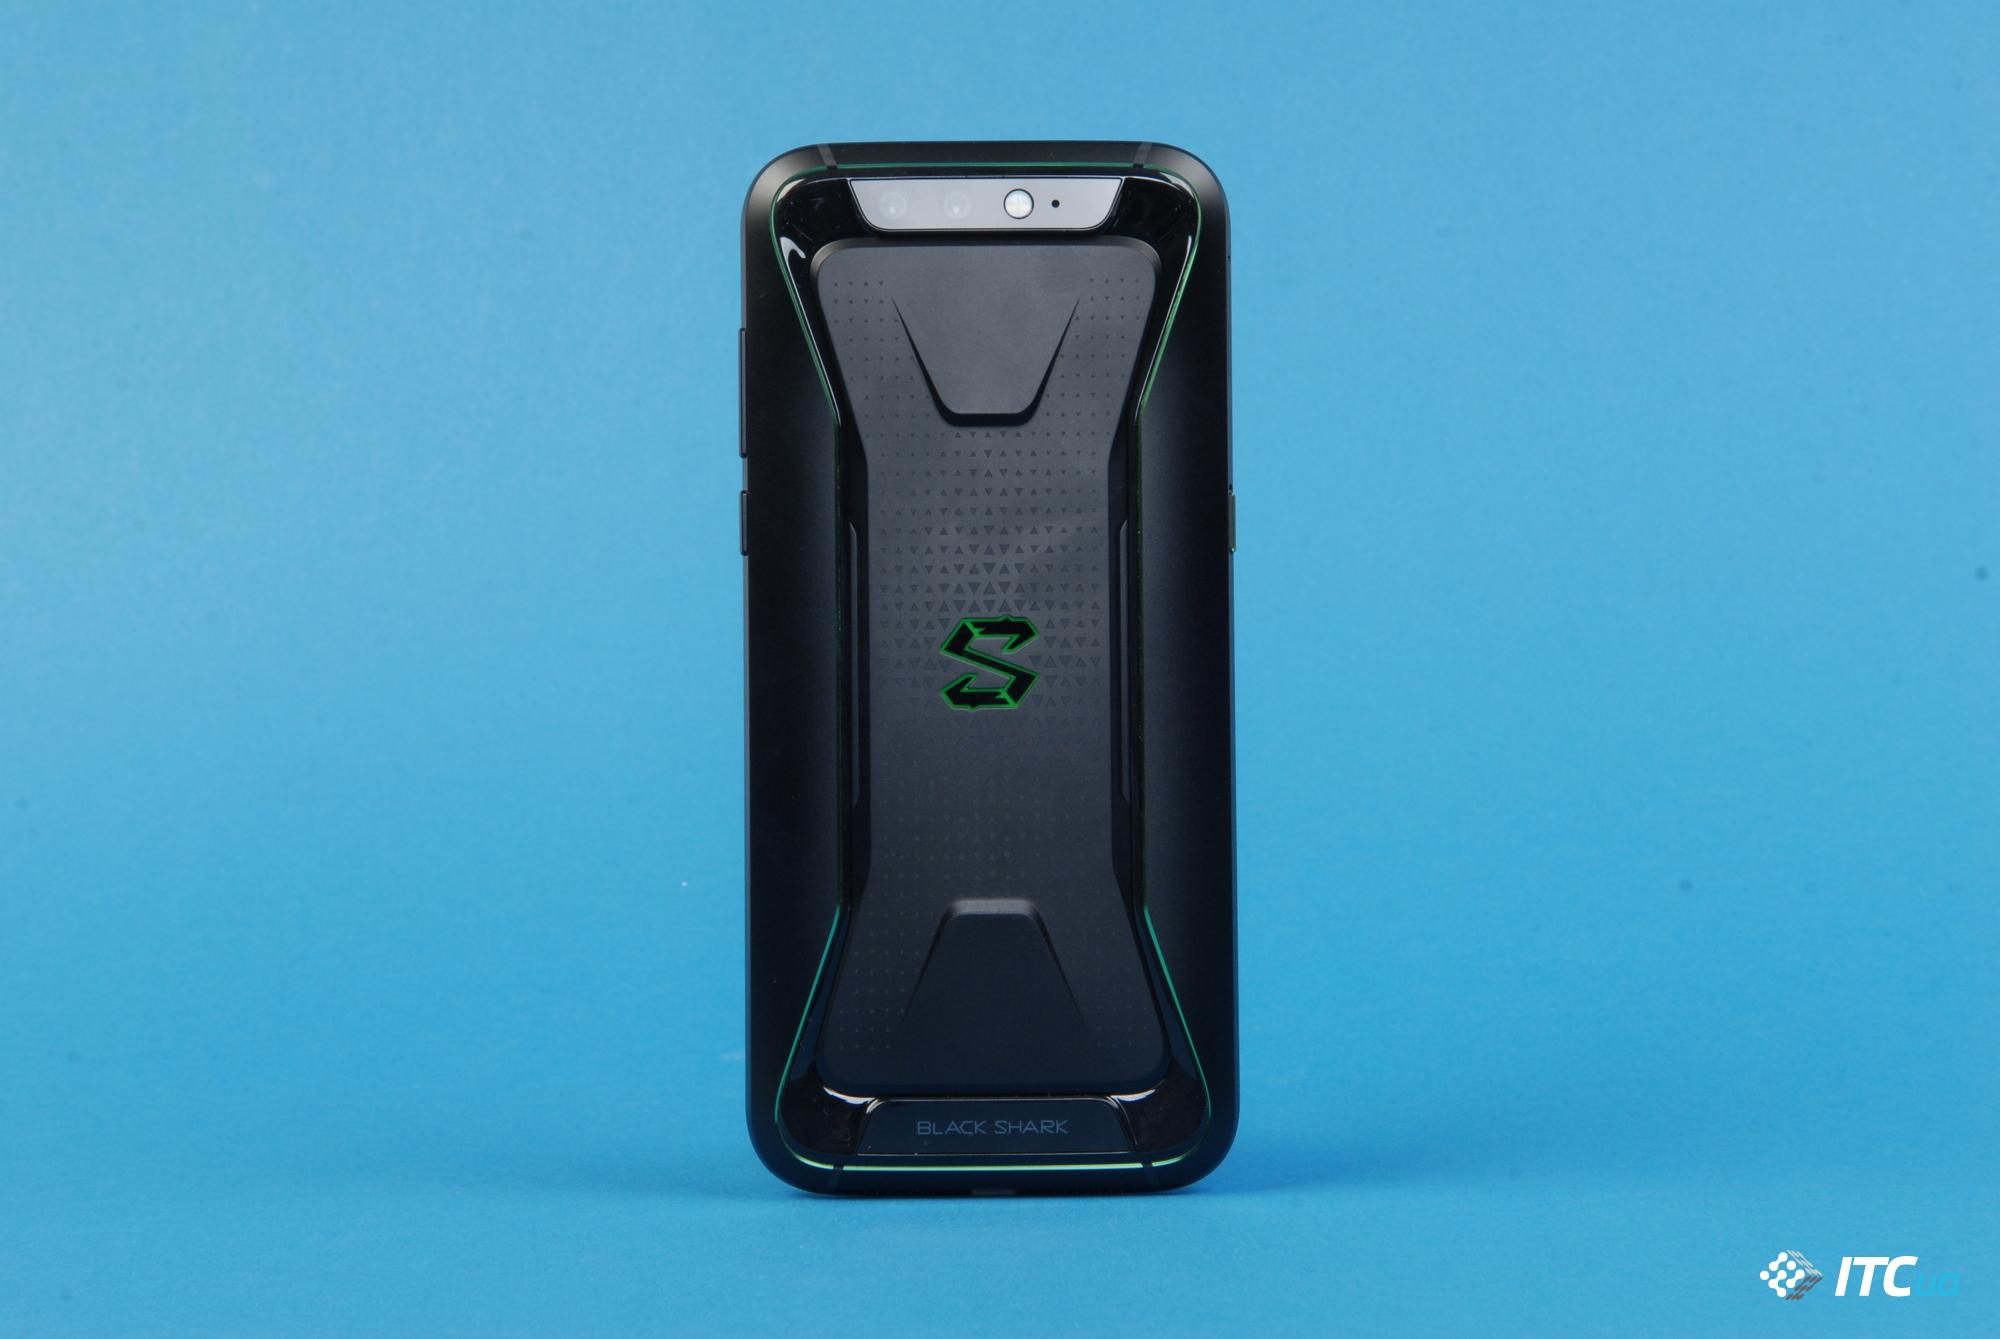 Xiaomi Black Shark 2 сосветящимся лого навидео?